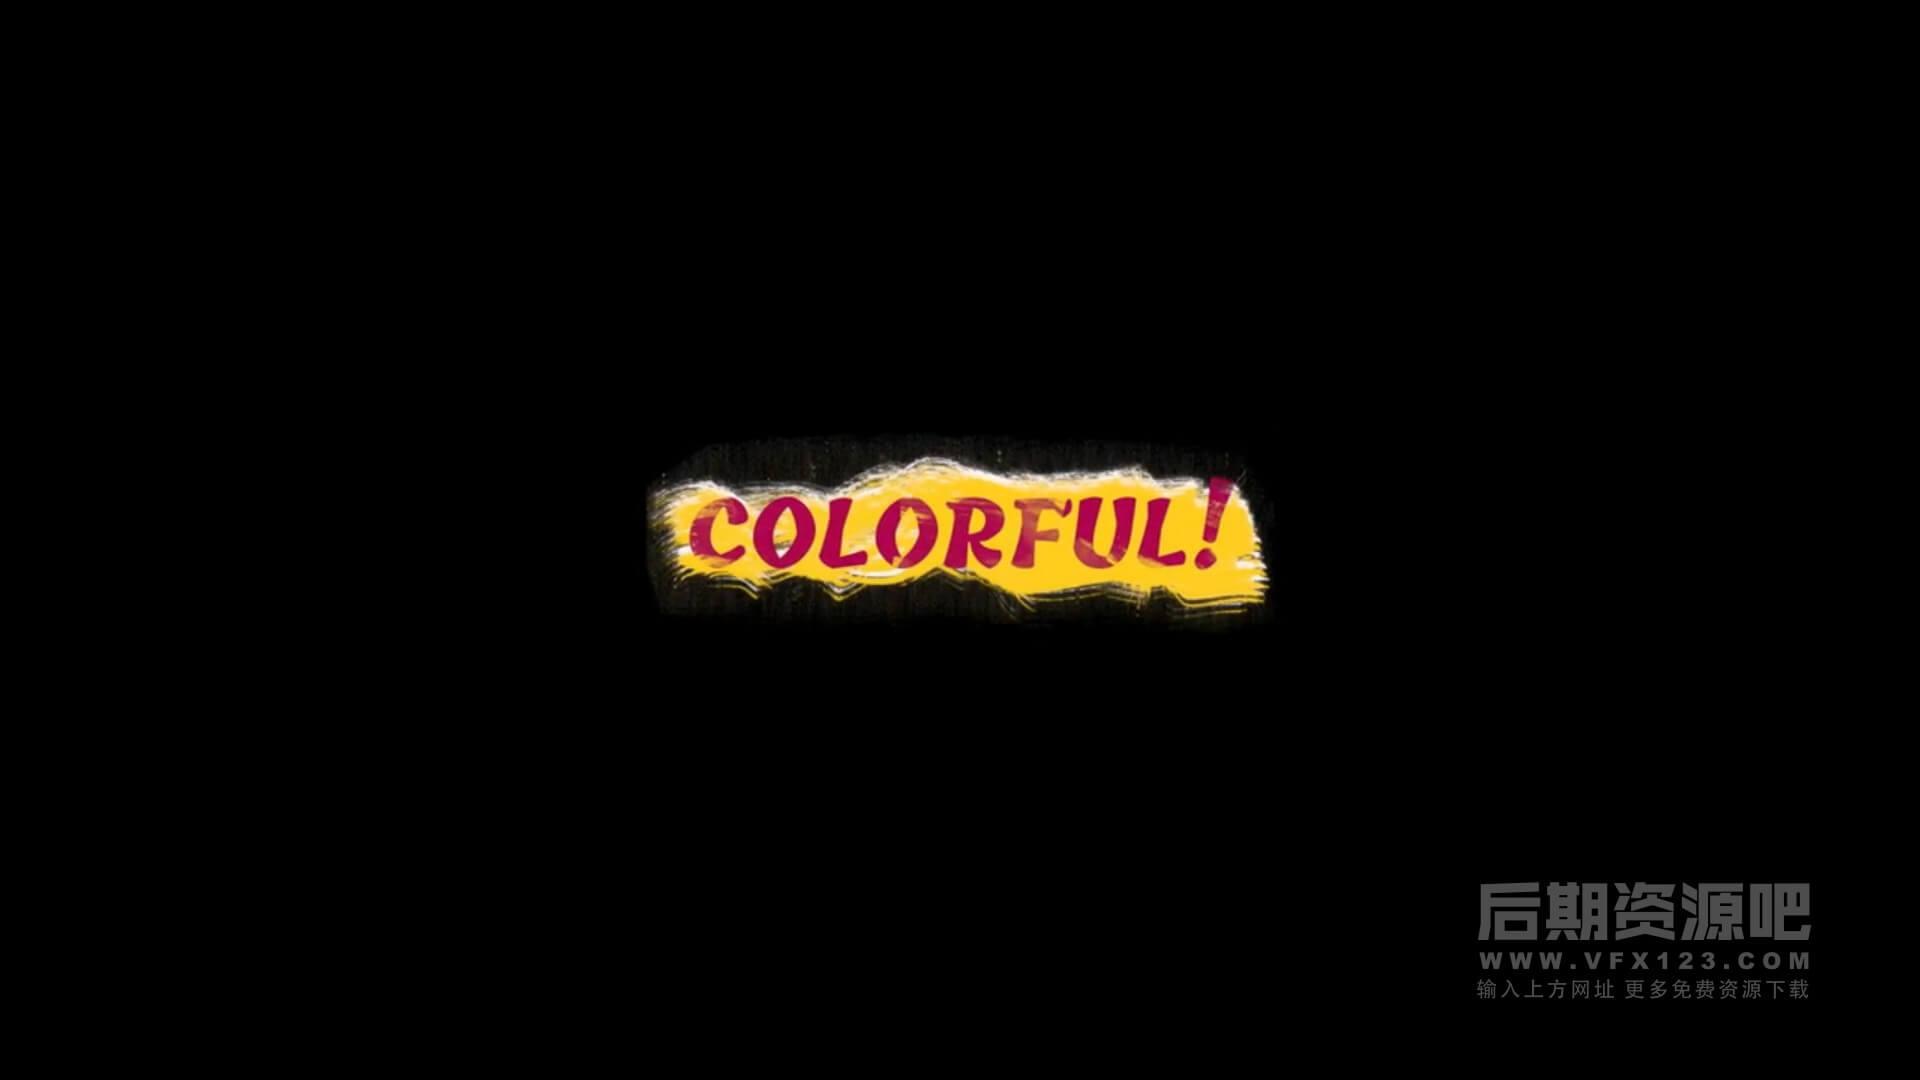 fcpx插件 16组卡通可爱彩色笔刷动画标题模板 Colorful Brush Titles